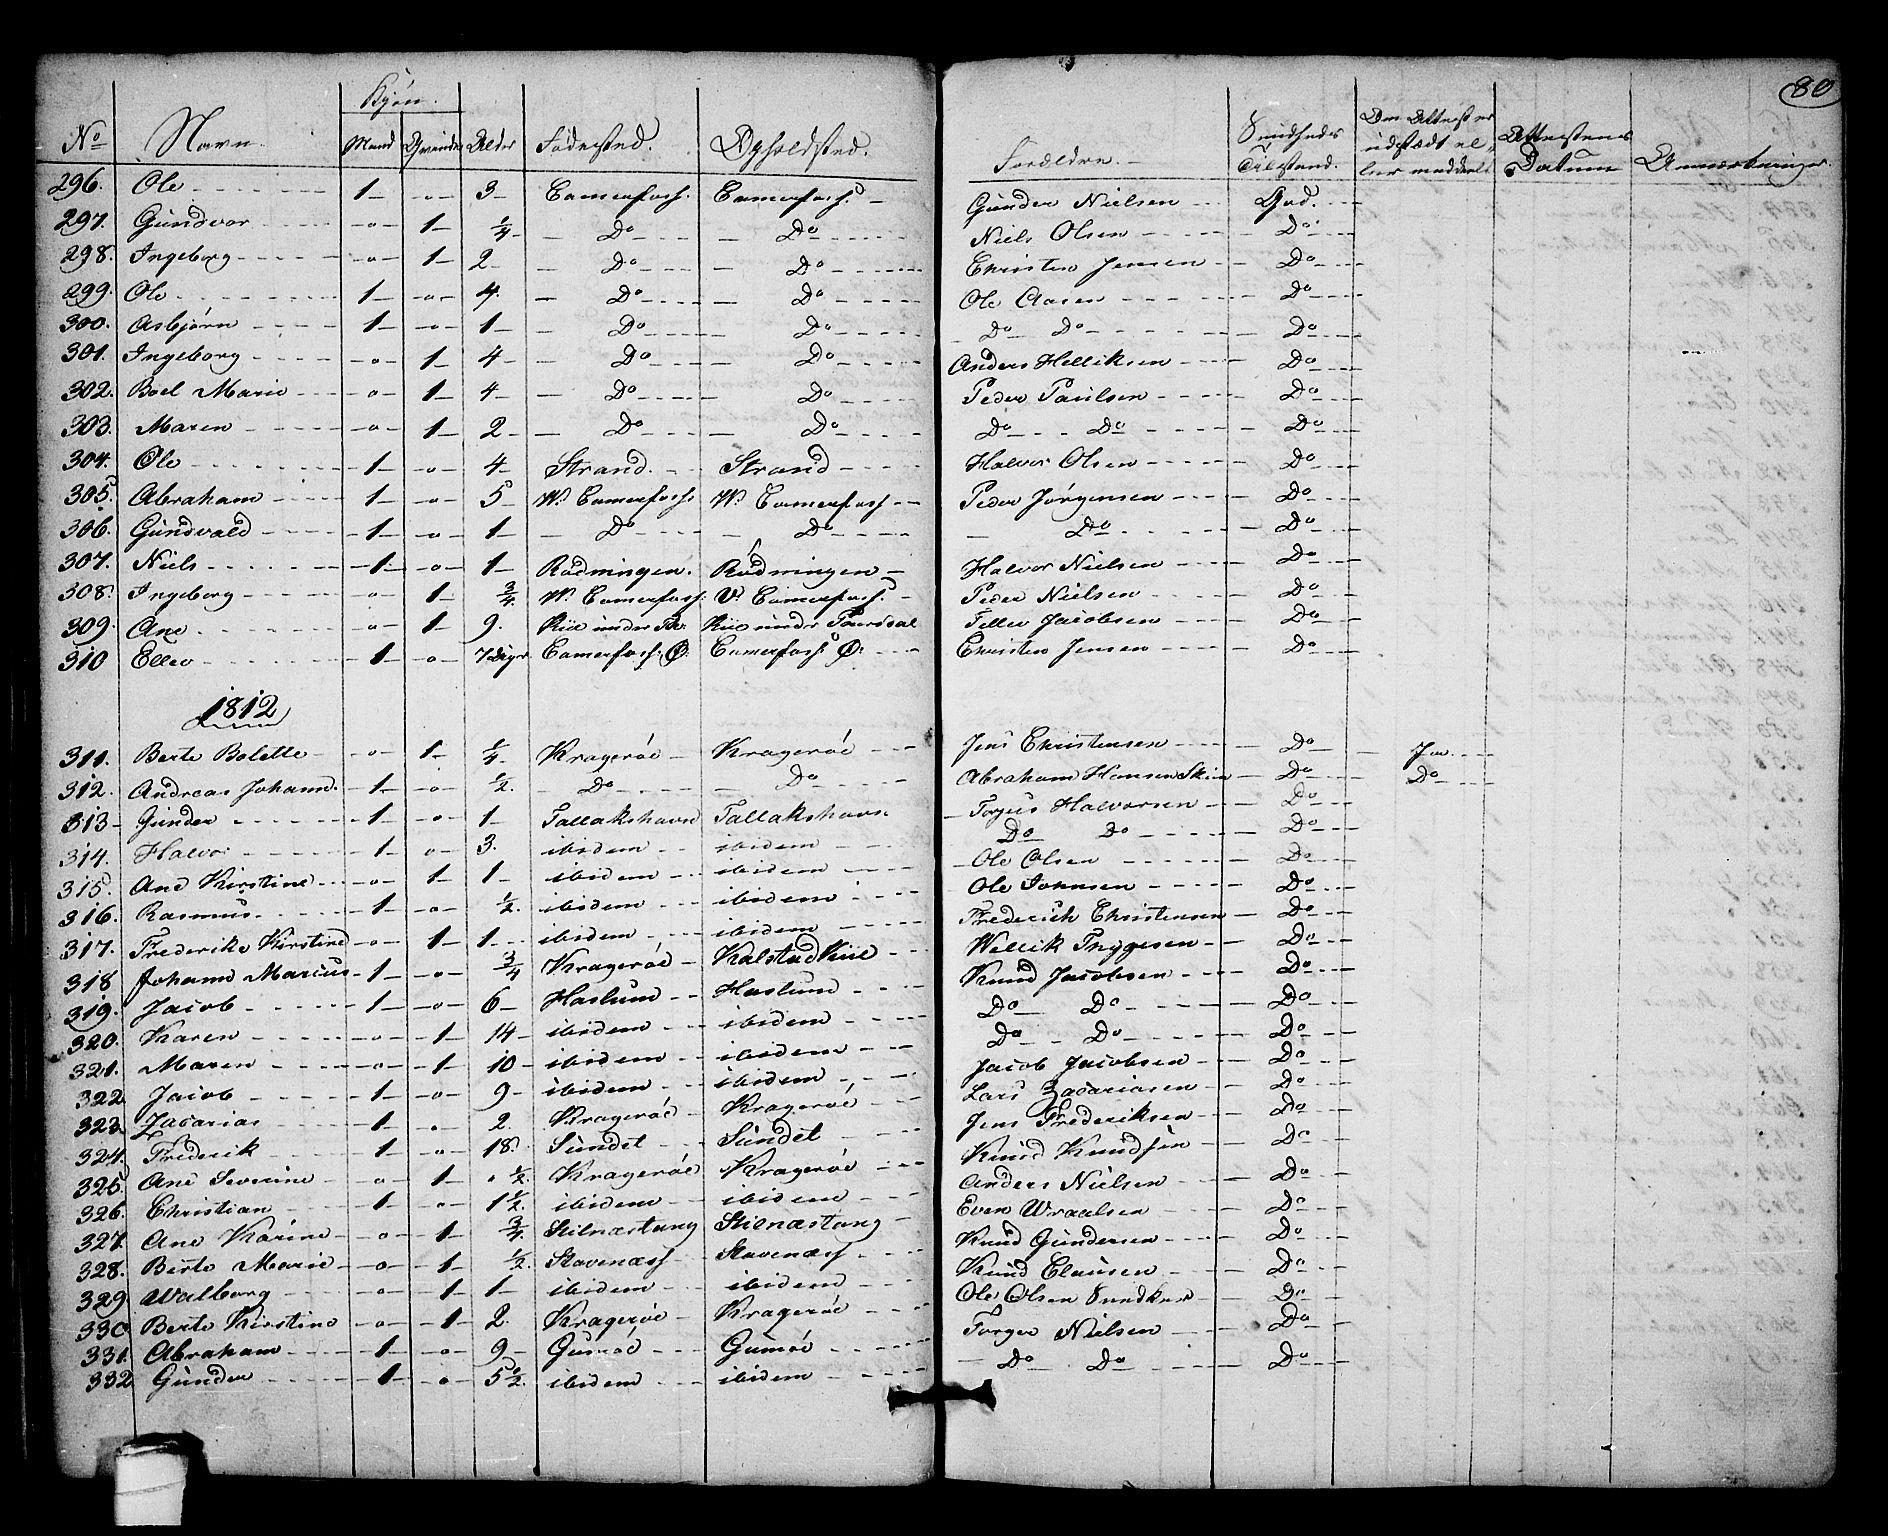 SAKO, Kragerø kirkebøker, F/Fa/L0003: Ministerialbok nr. 3, 1802-1813, s. 80